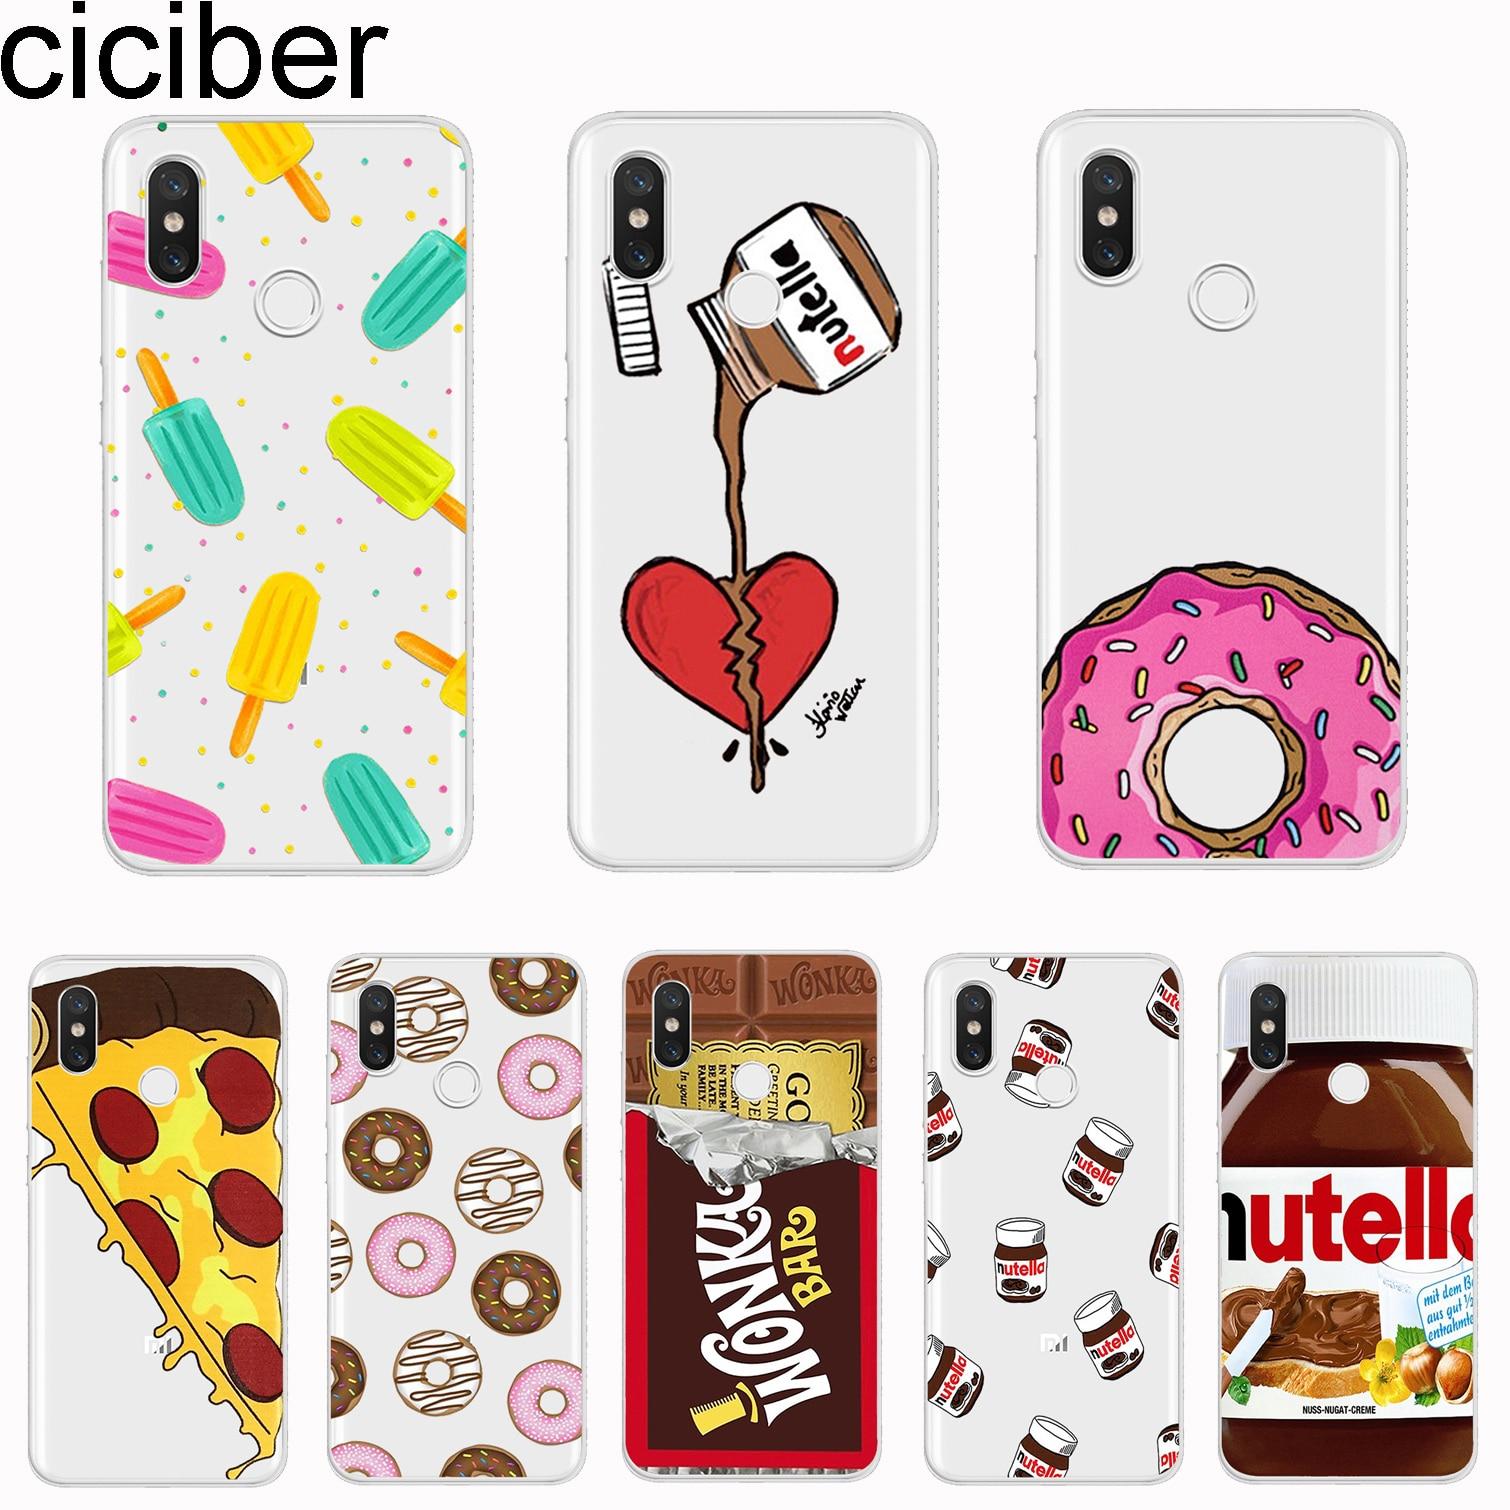 6235ef1946 ciciber For Xiaomi MIX MAX 3 2 1 S Pro MI A2 A1 9 8 6 5 X 5C 5S Plus Lite  SE Pocophone F1 Phone Cases Soft TPU Donuts Chocolate